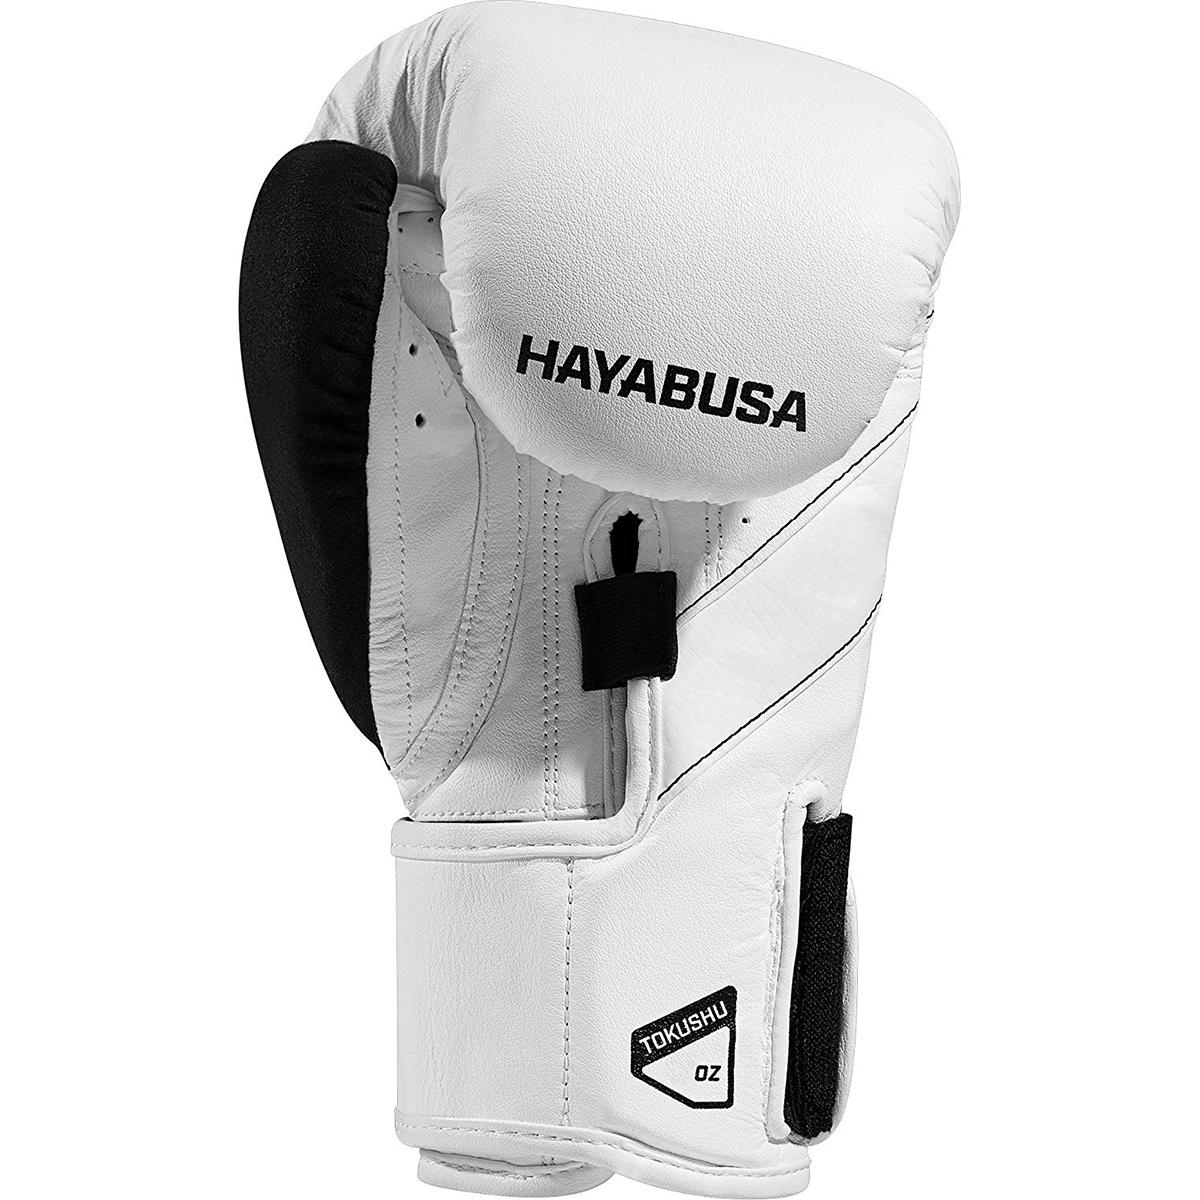 Hayabusa-T3-Dual-X-Hook-and-Loop-Closure-Vylar-Leather-Training-Boxing-Gloves thumbnail 24